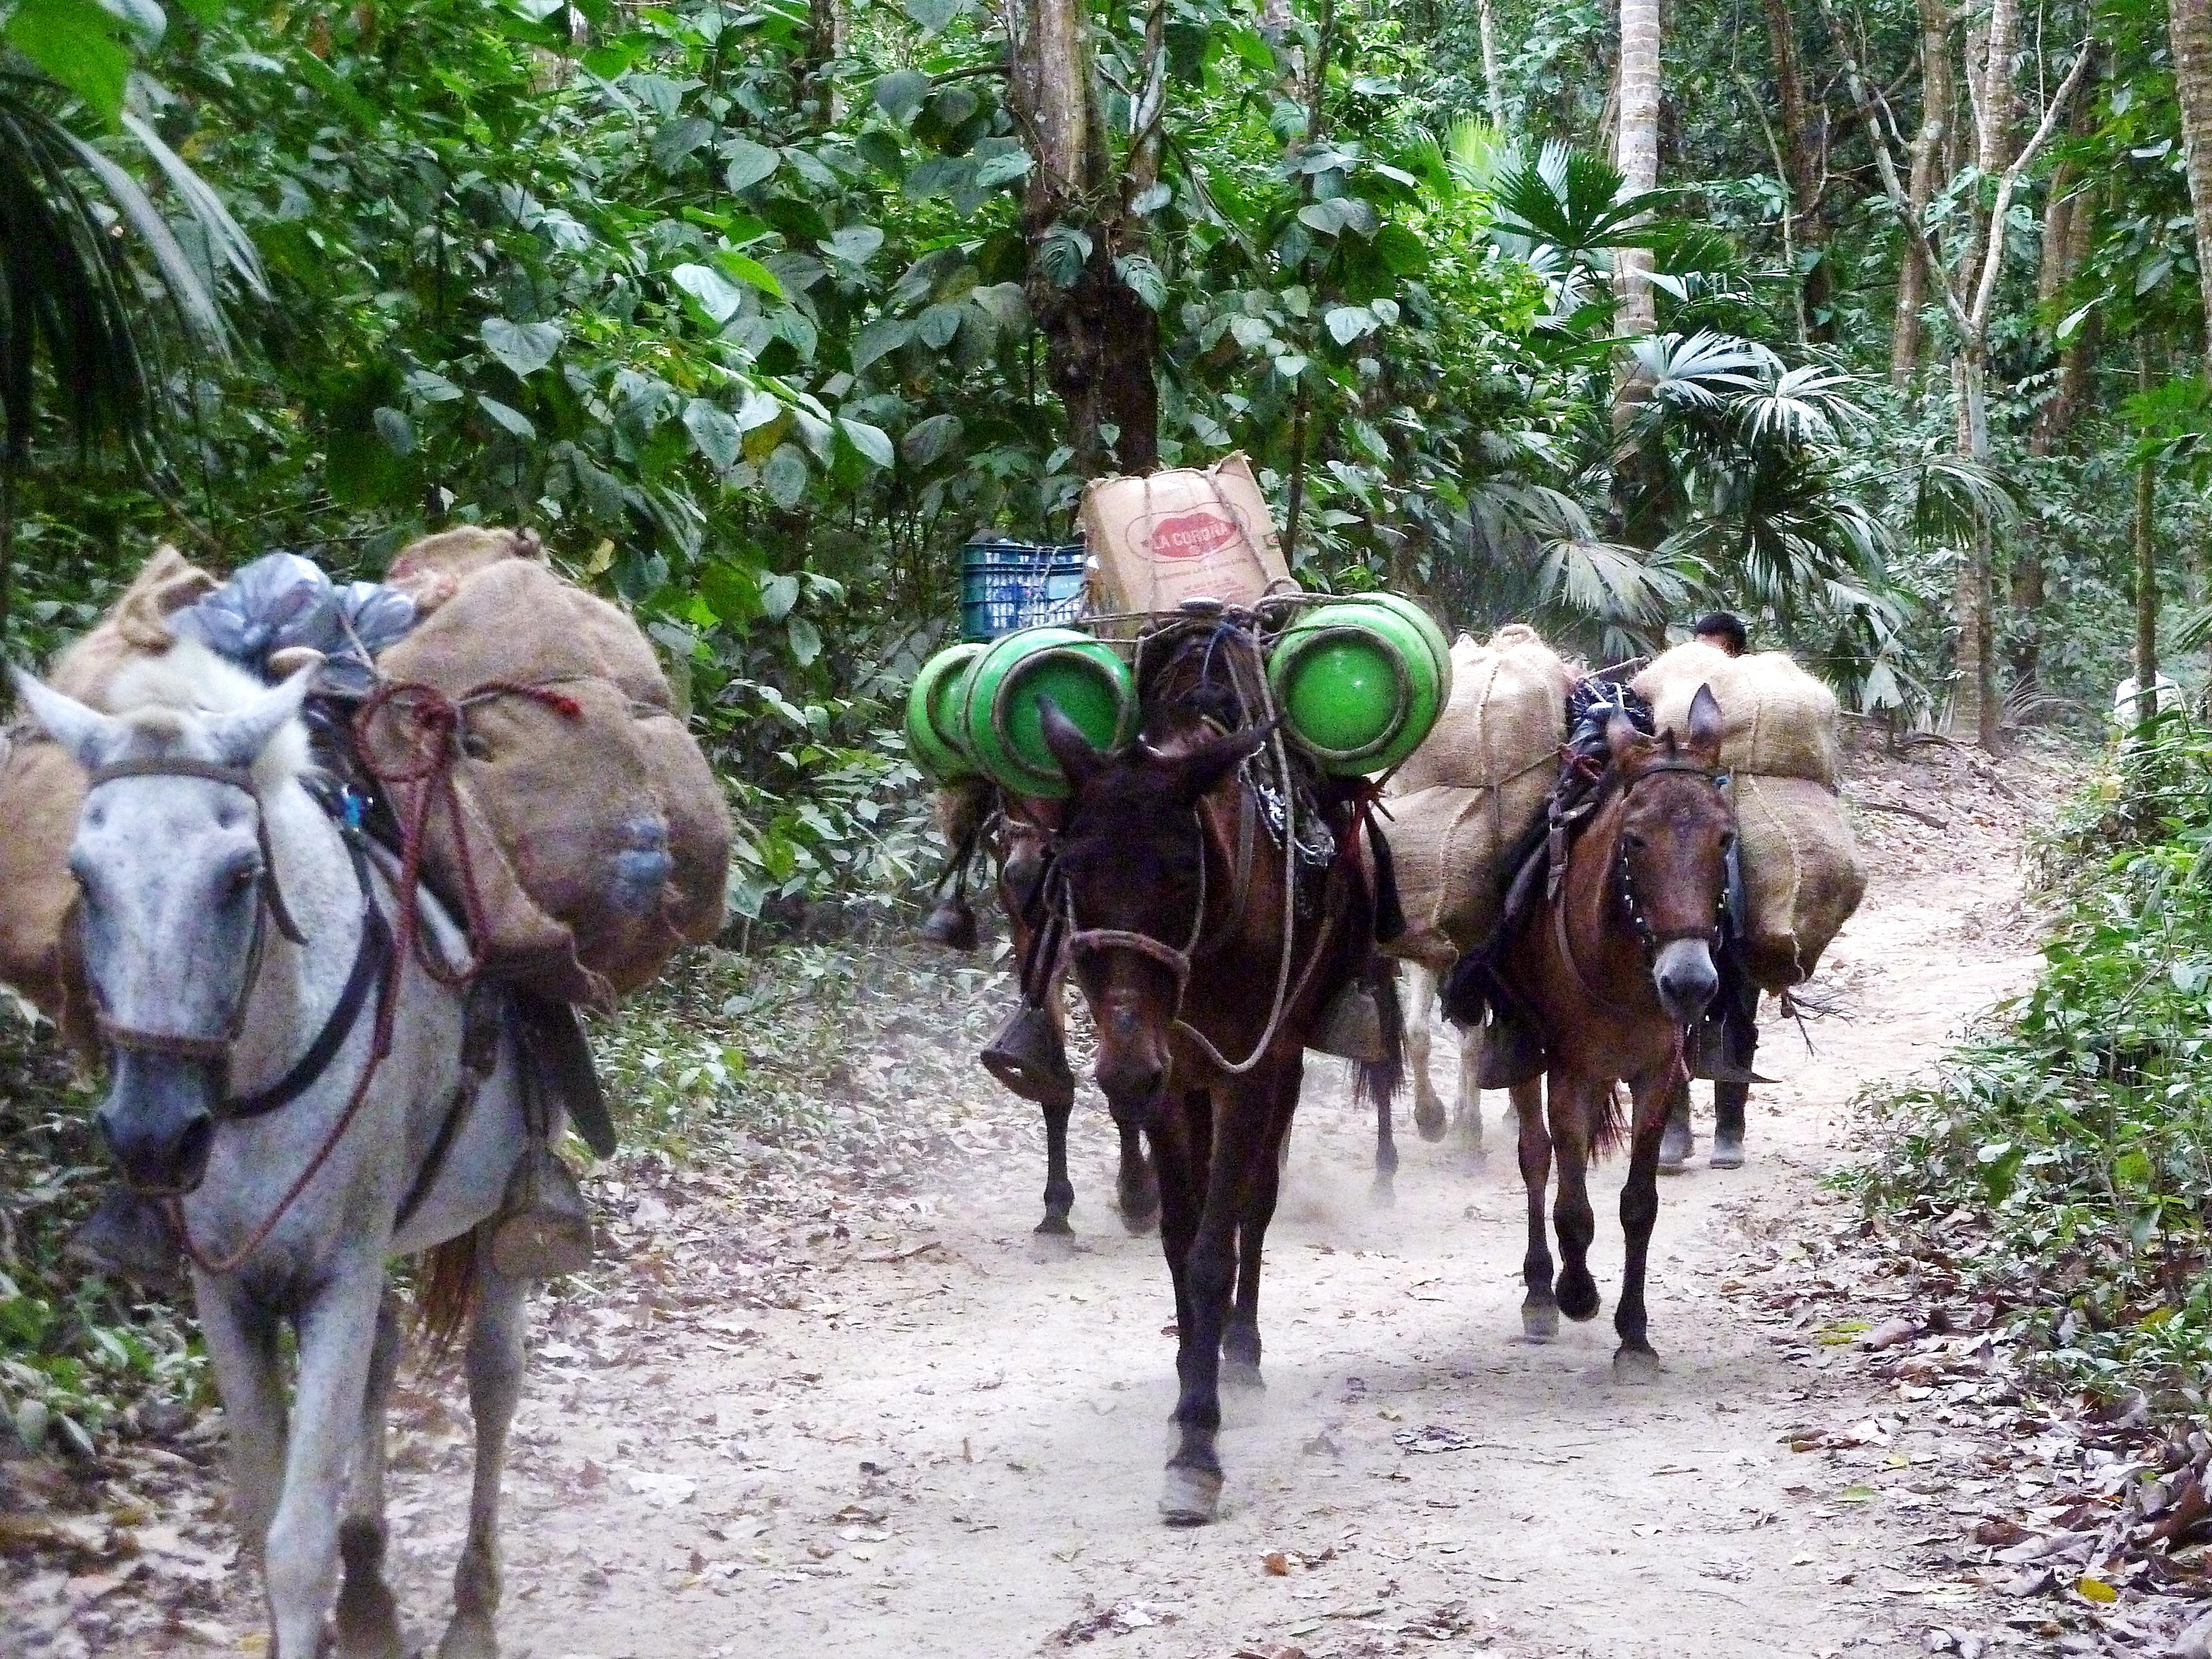 File:104 Donkeys in Tayrona Park Colombia.JPG - Wikimedia ...